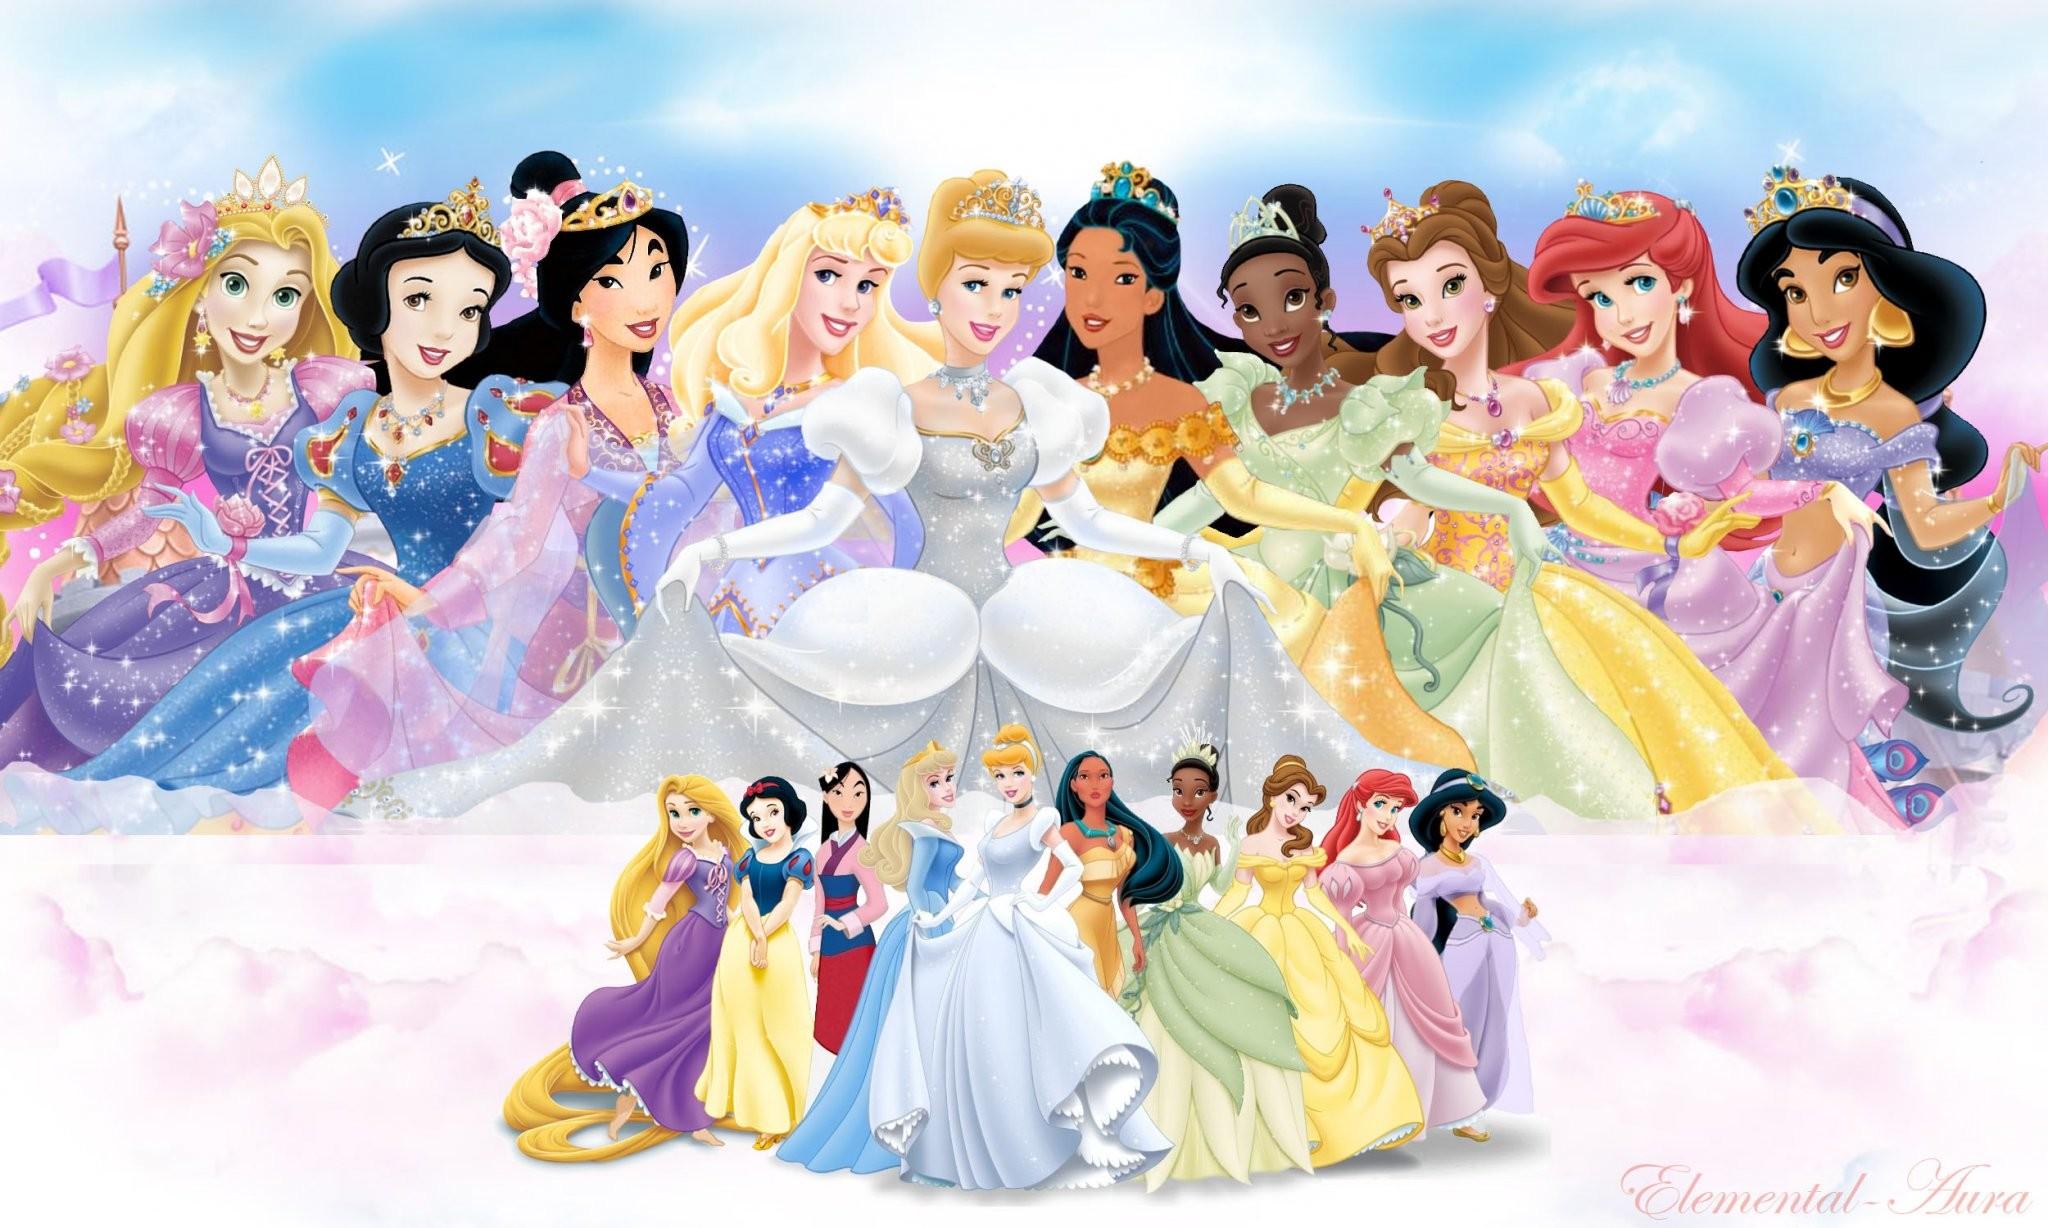 Disney Princesses Wallpaper 1